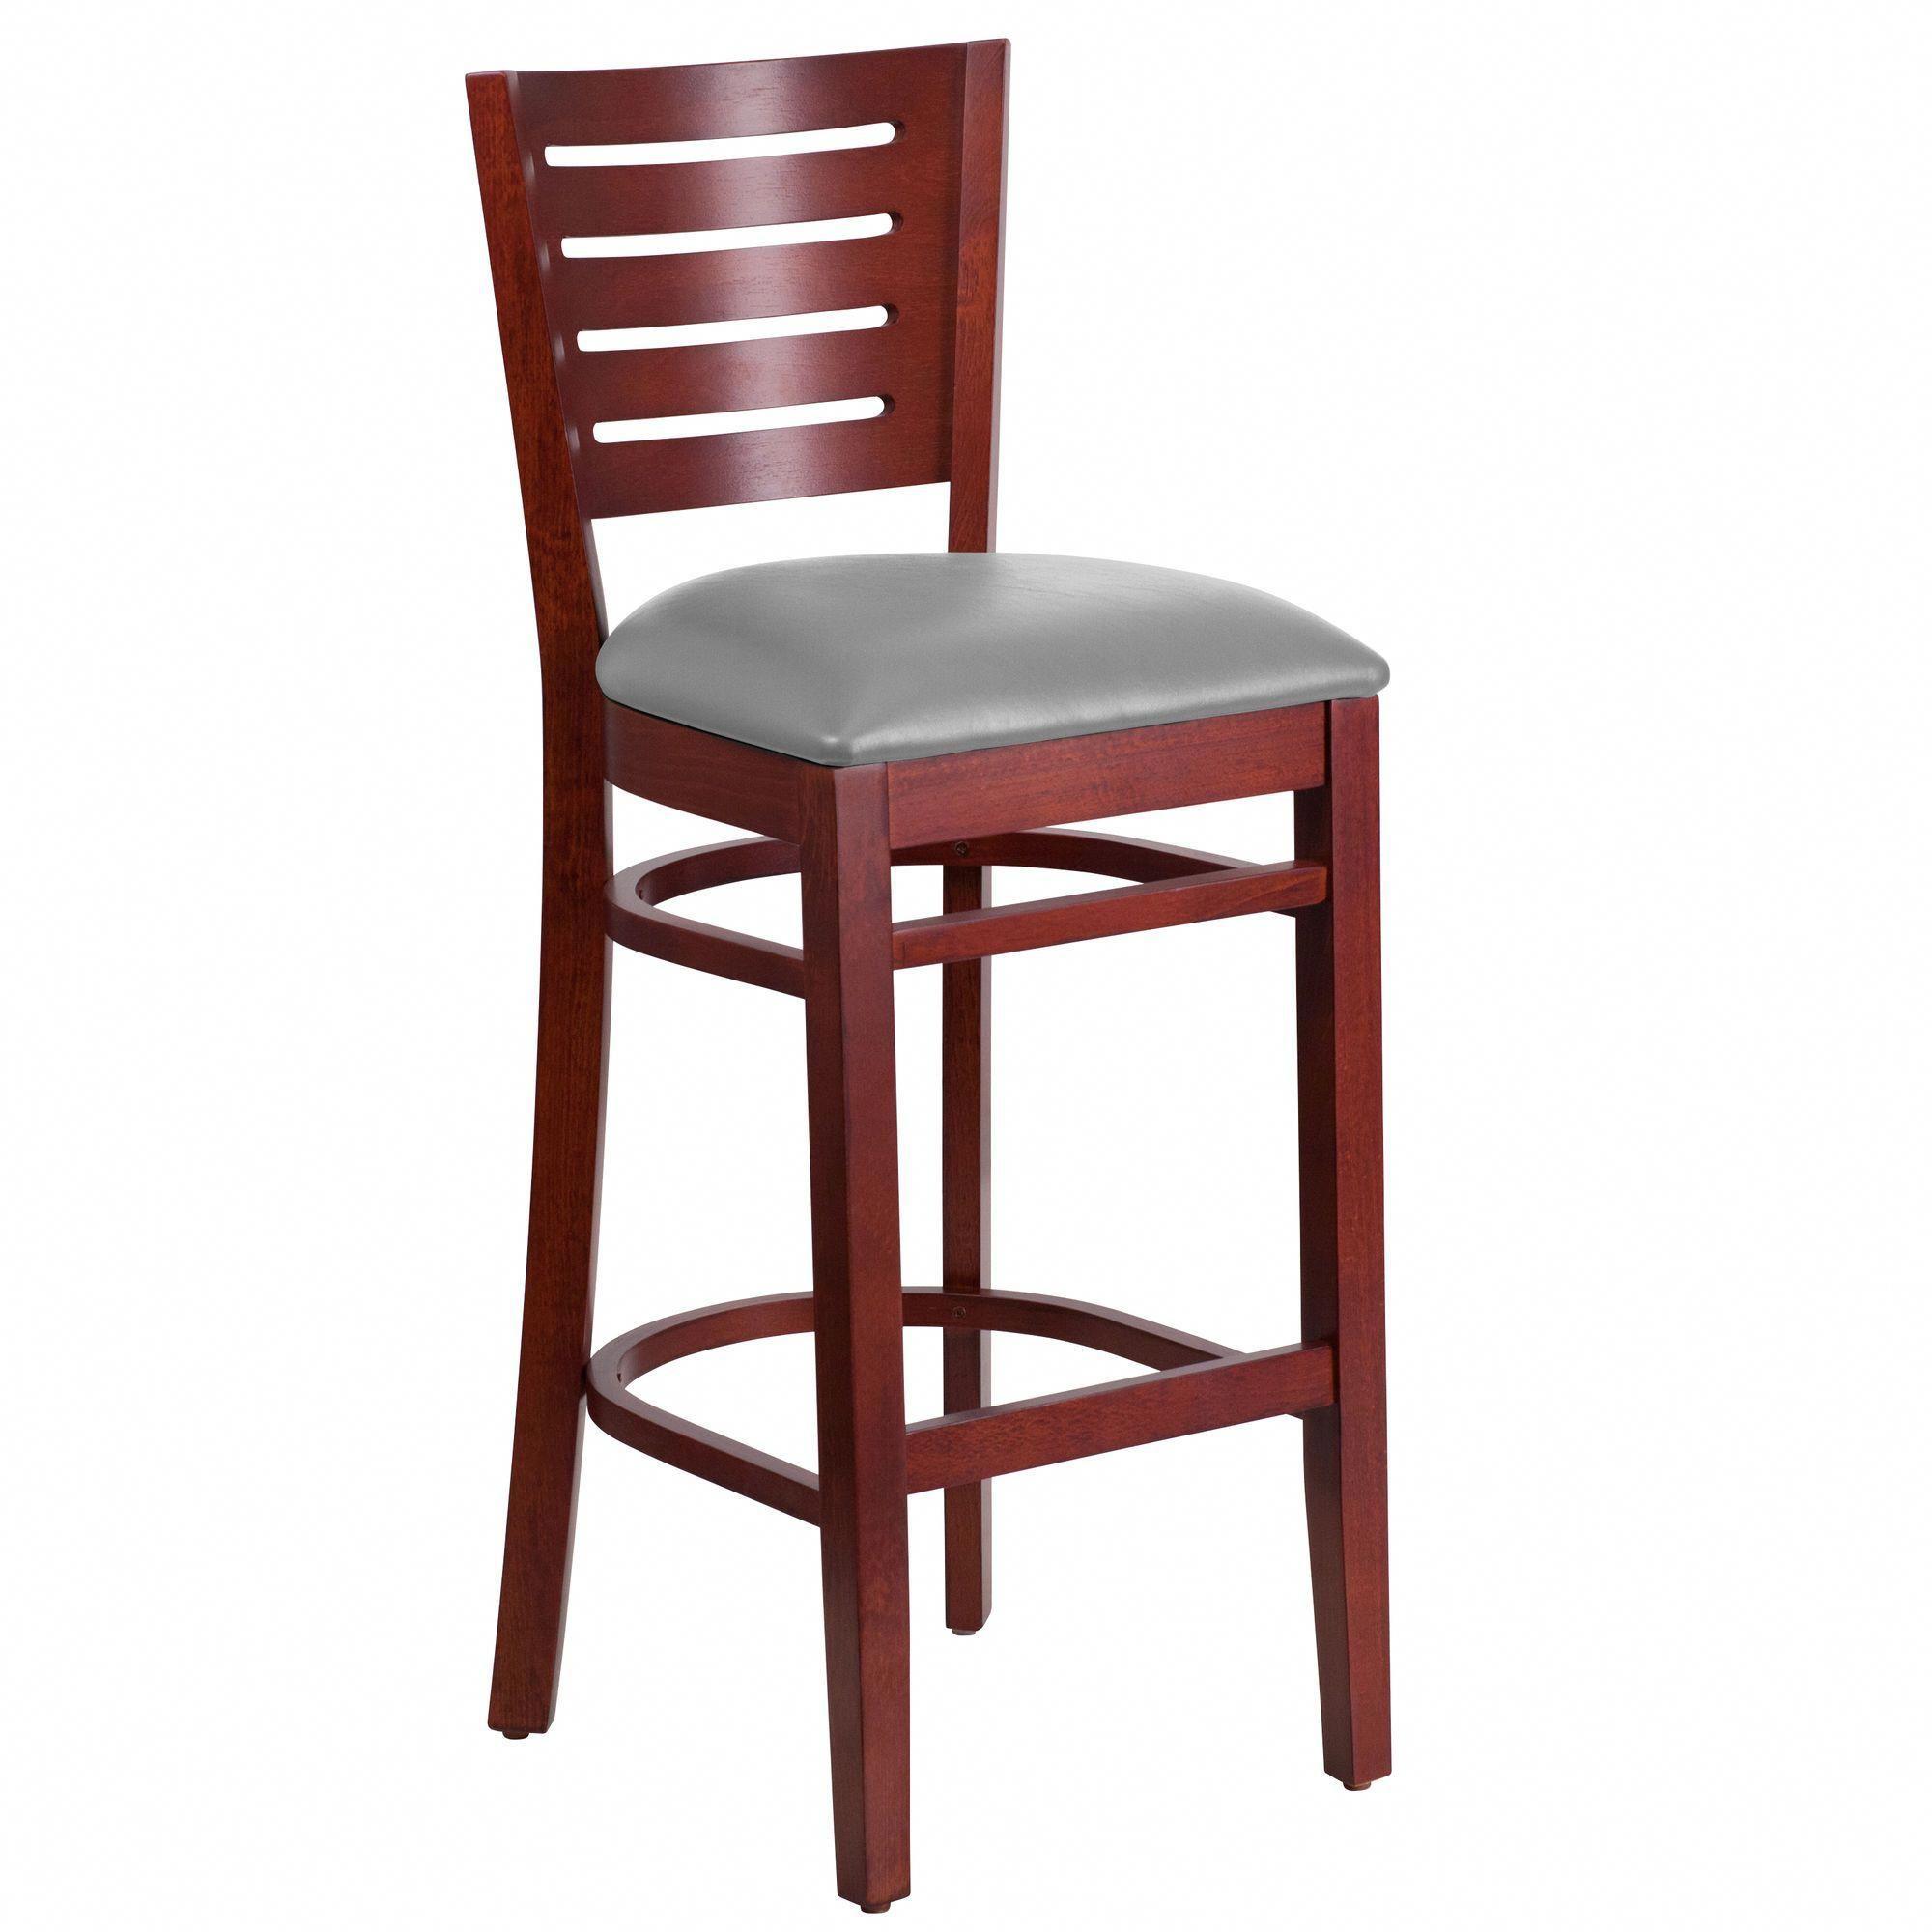 Craft Beer Recipes Reupholster Stool Stella Rose Wine Bar Printables Bar Stools Stool Farmhouse Table Chairs